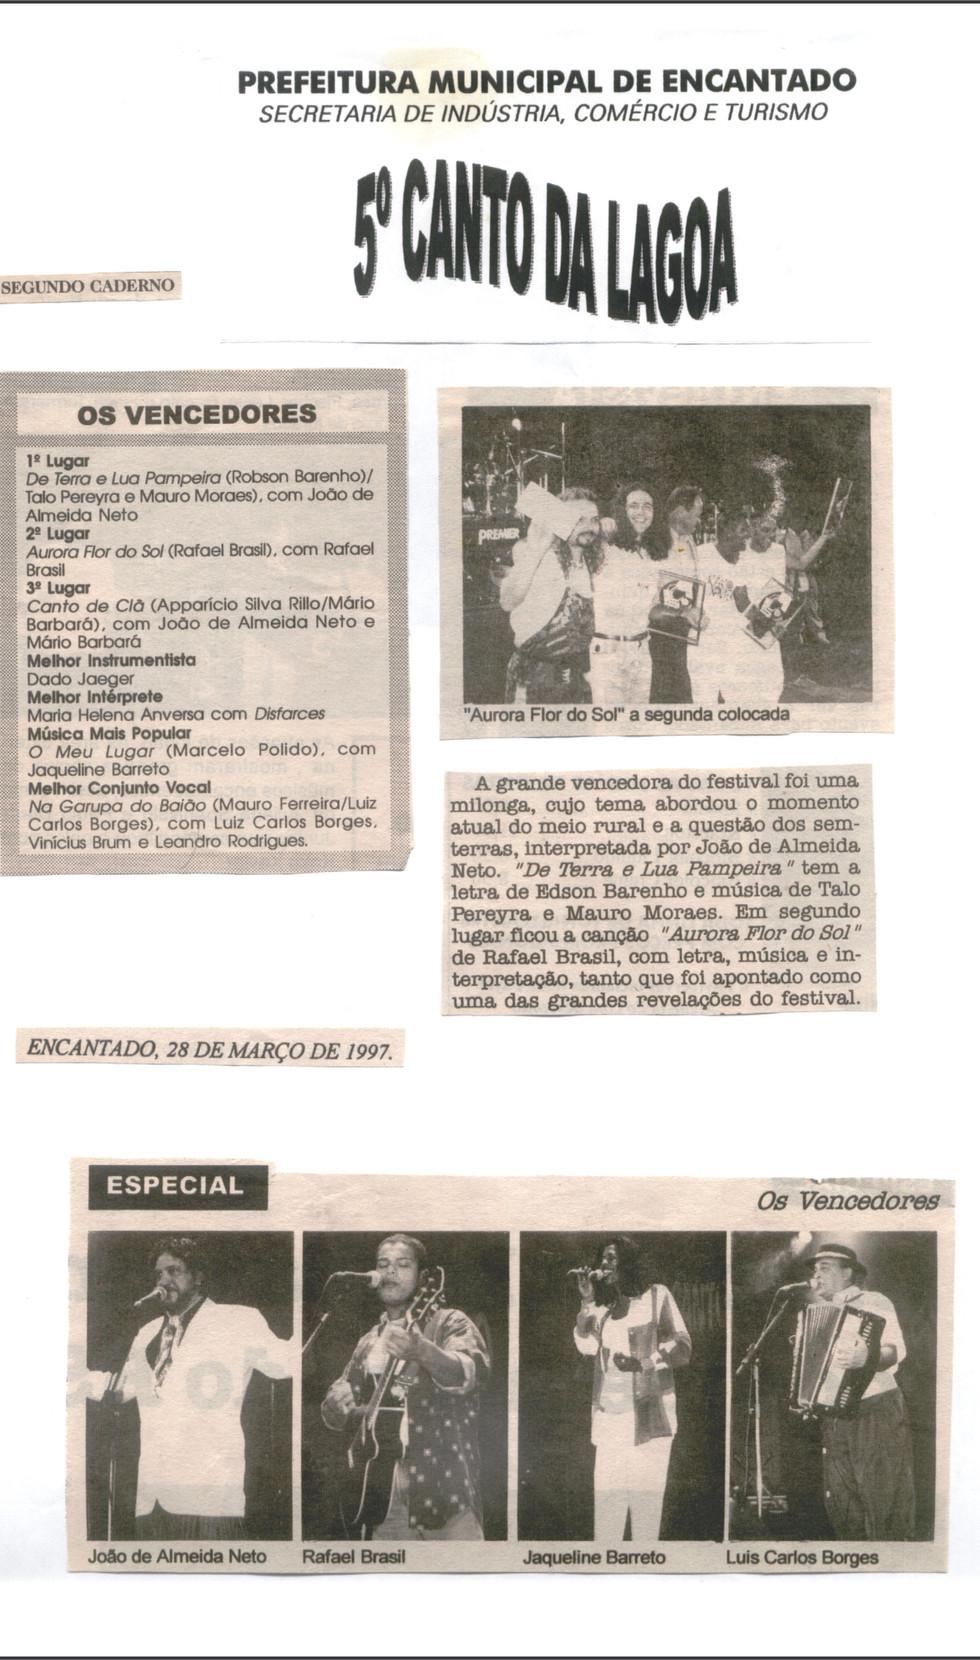 CANTO DA LAGOA - 02.jpg